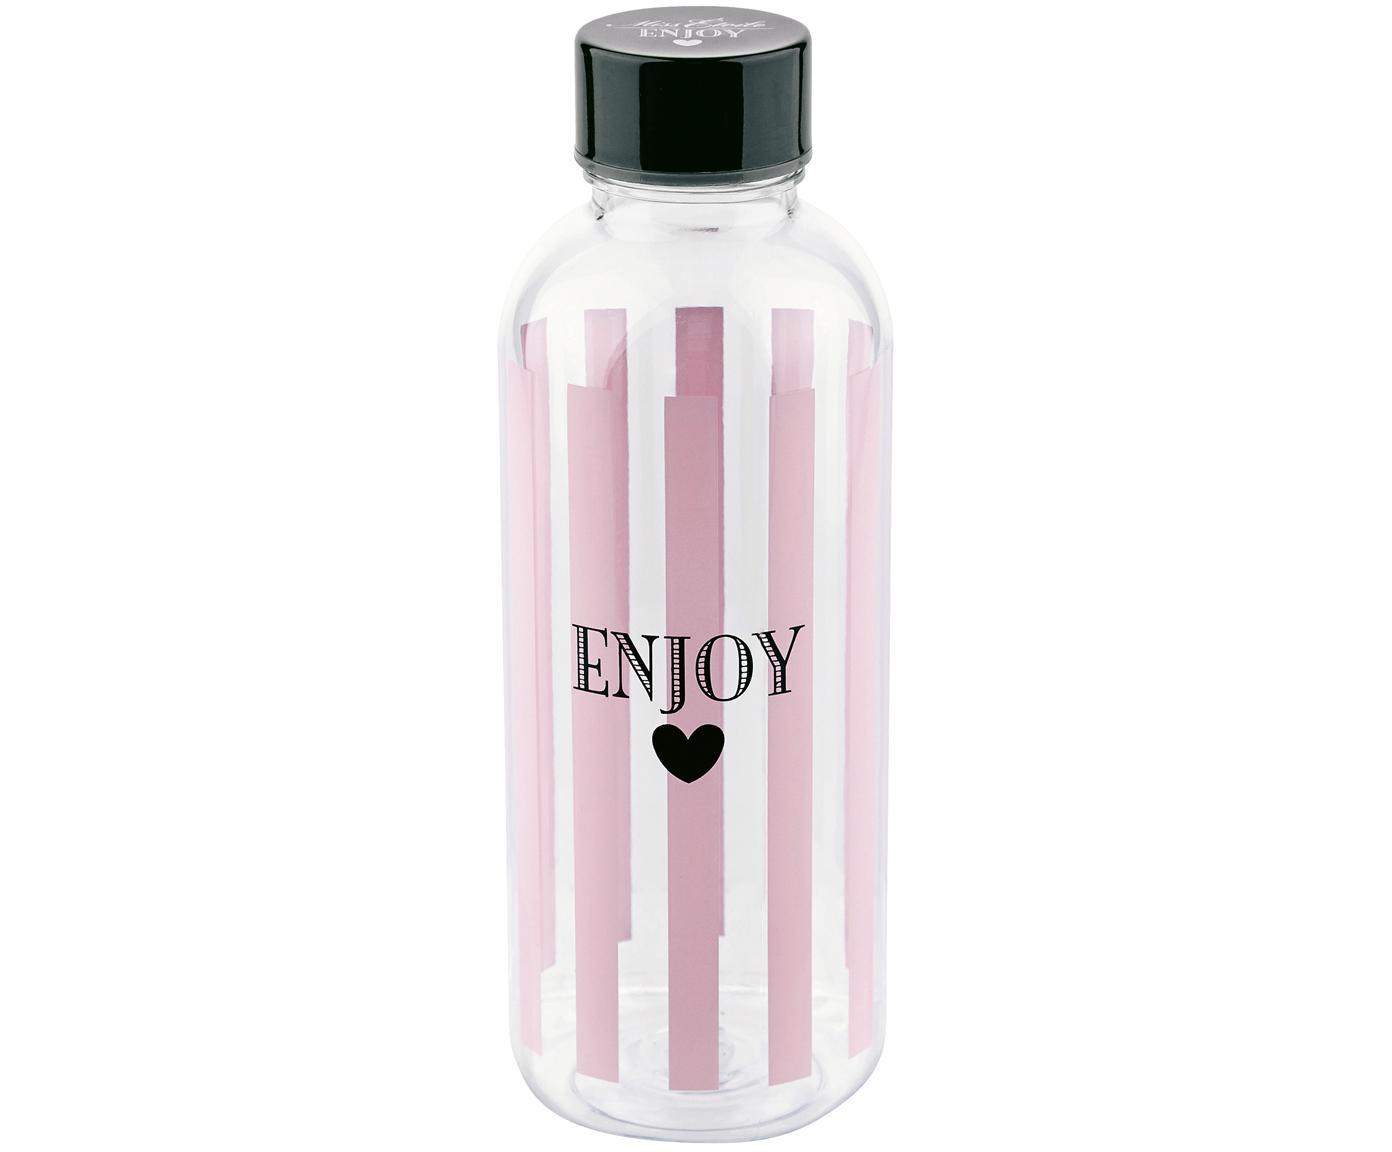 Drinkfles  Enjoy, Kunststof, vrij van BPA en ftalaten, Fles: transparant, roze, zwart<br>Deksel: zwart, Ø 8 x H 21 cm